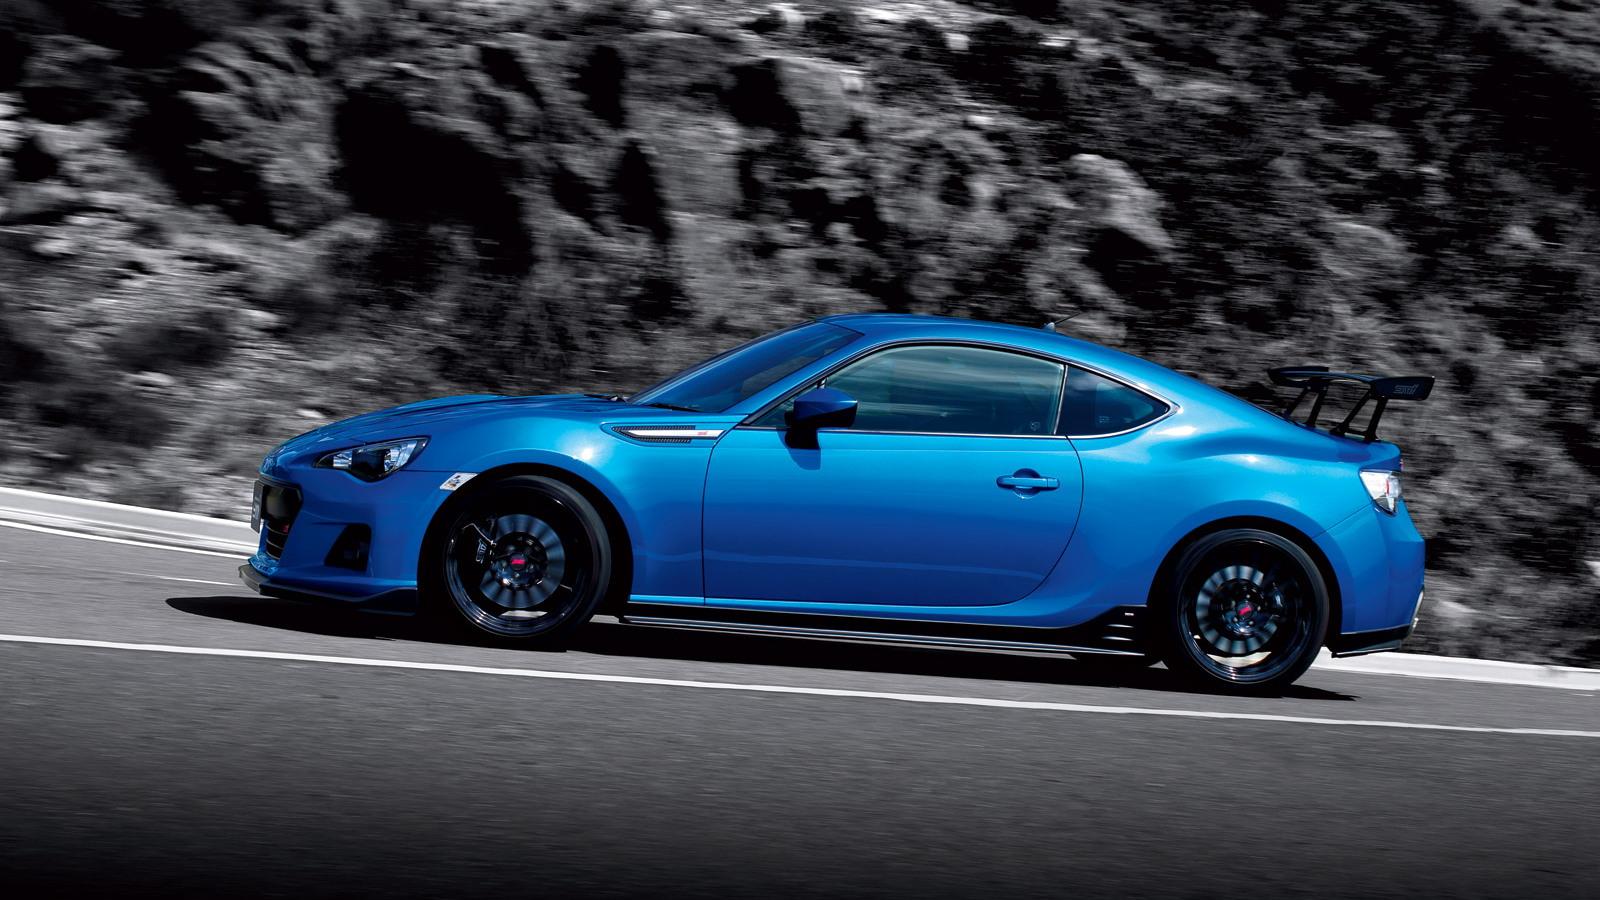 2014 Subaru BRZ tS